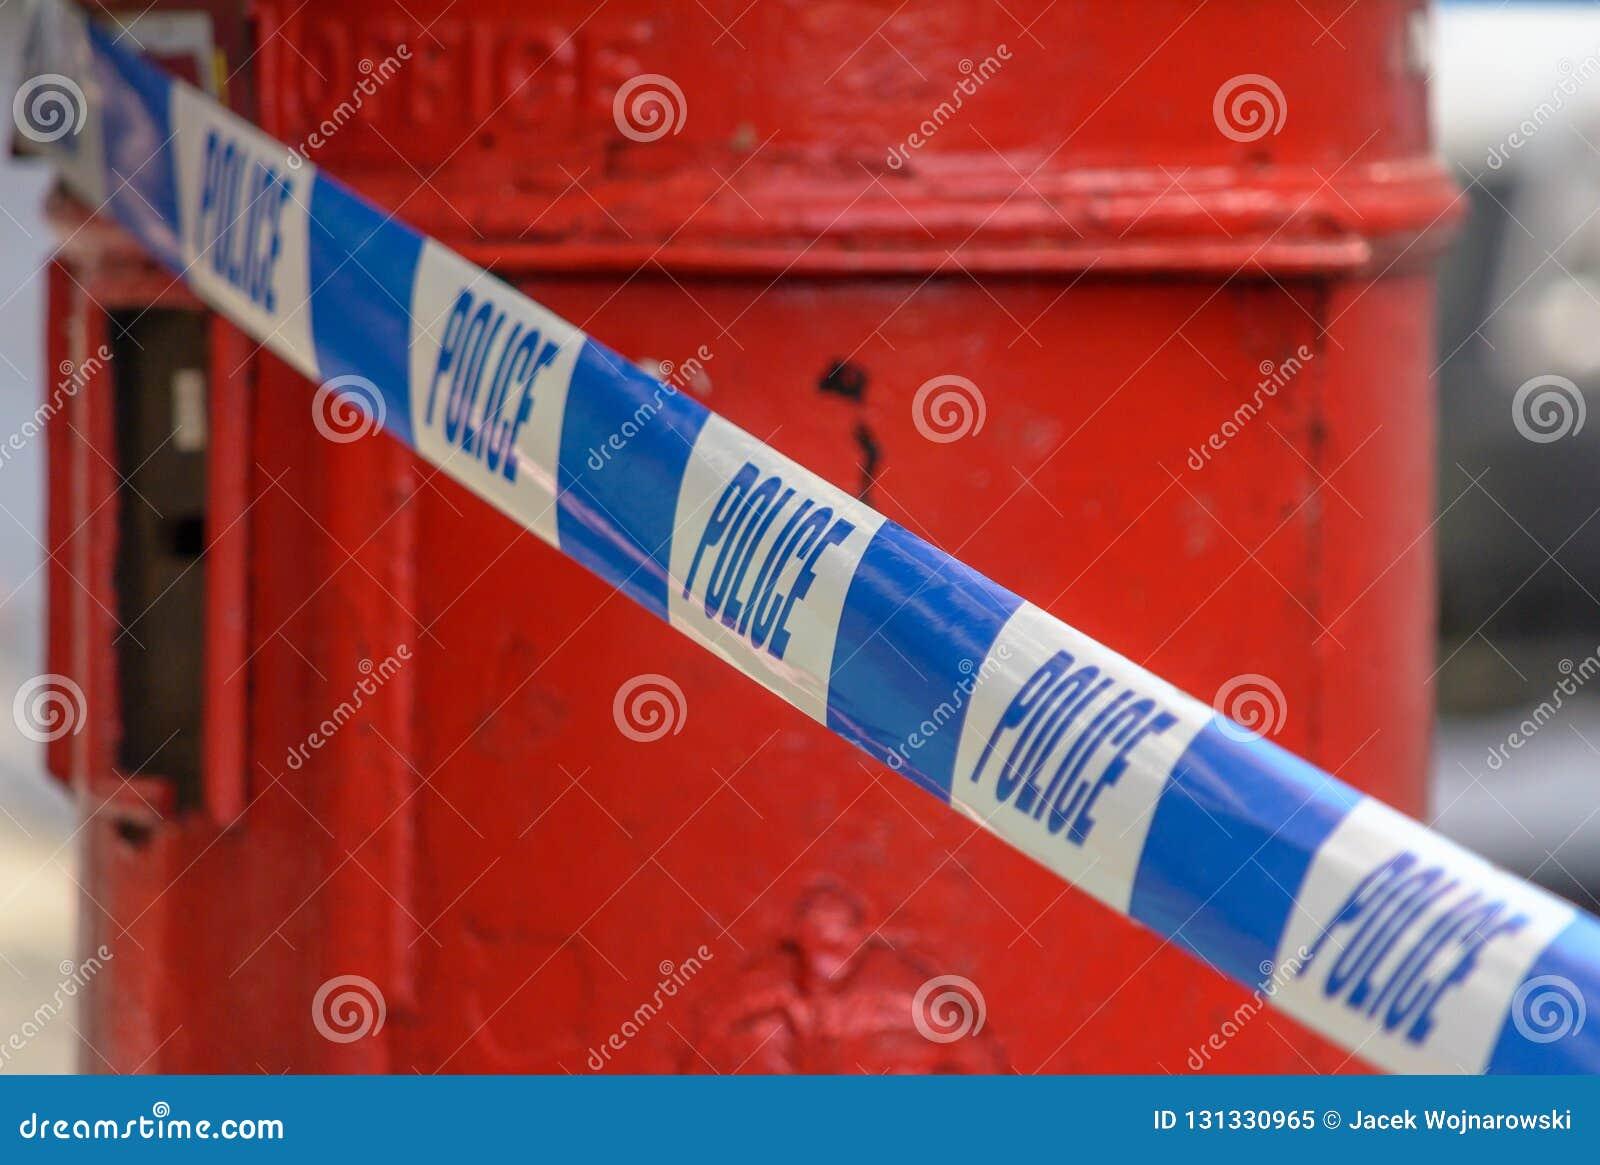 Fita britânica da polícia em Front Of Red Post Box